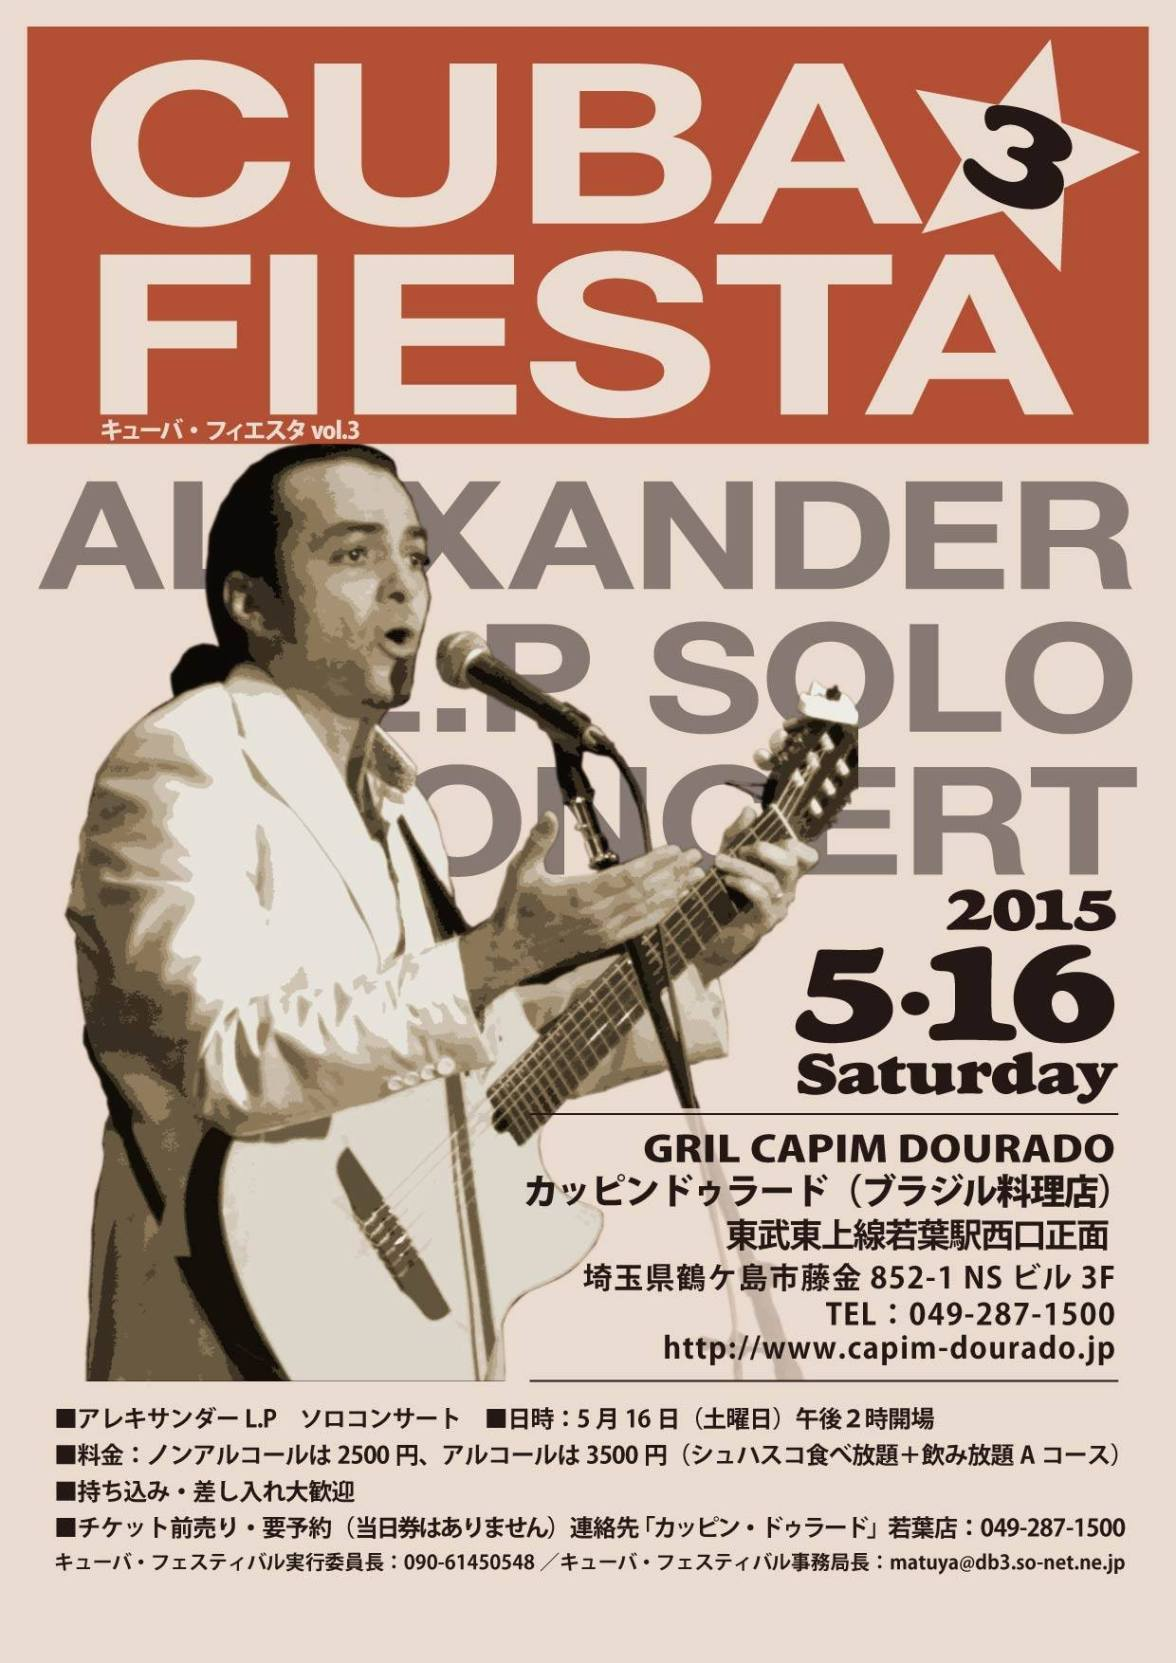 16 de mayo - Alexander LP en Grill Capim Dourado de Fujigane - Tsurugashima-shi, Saitama